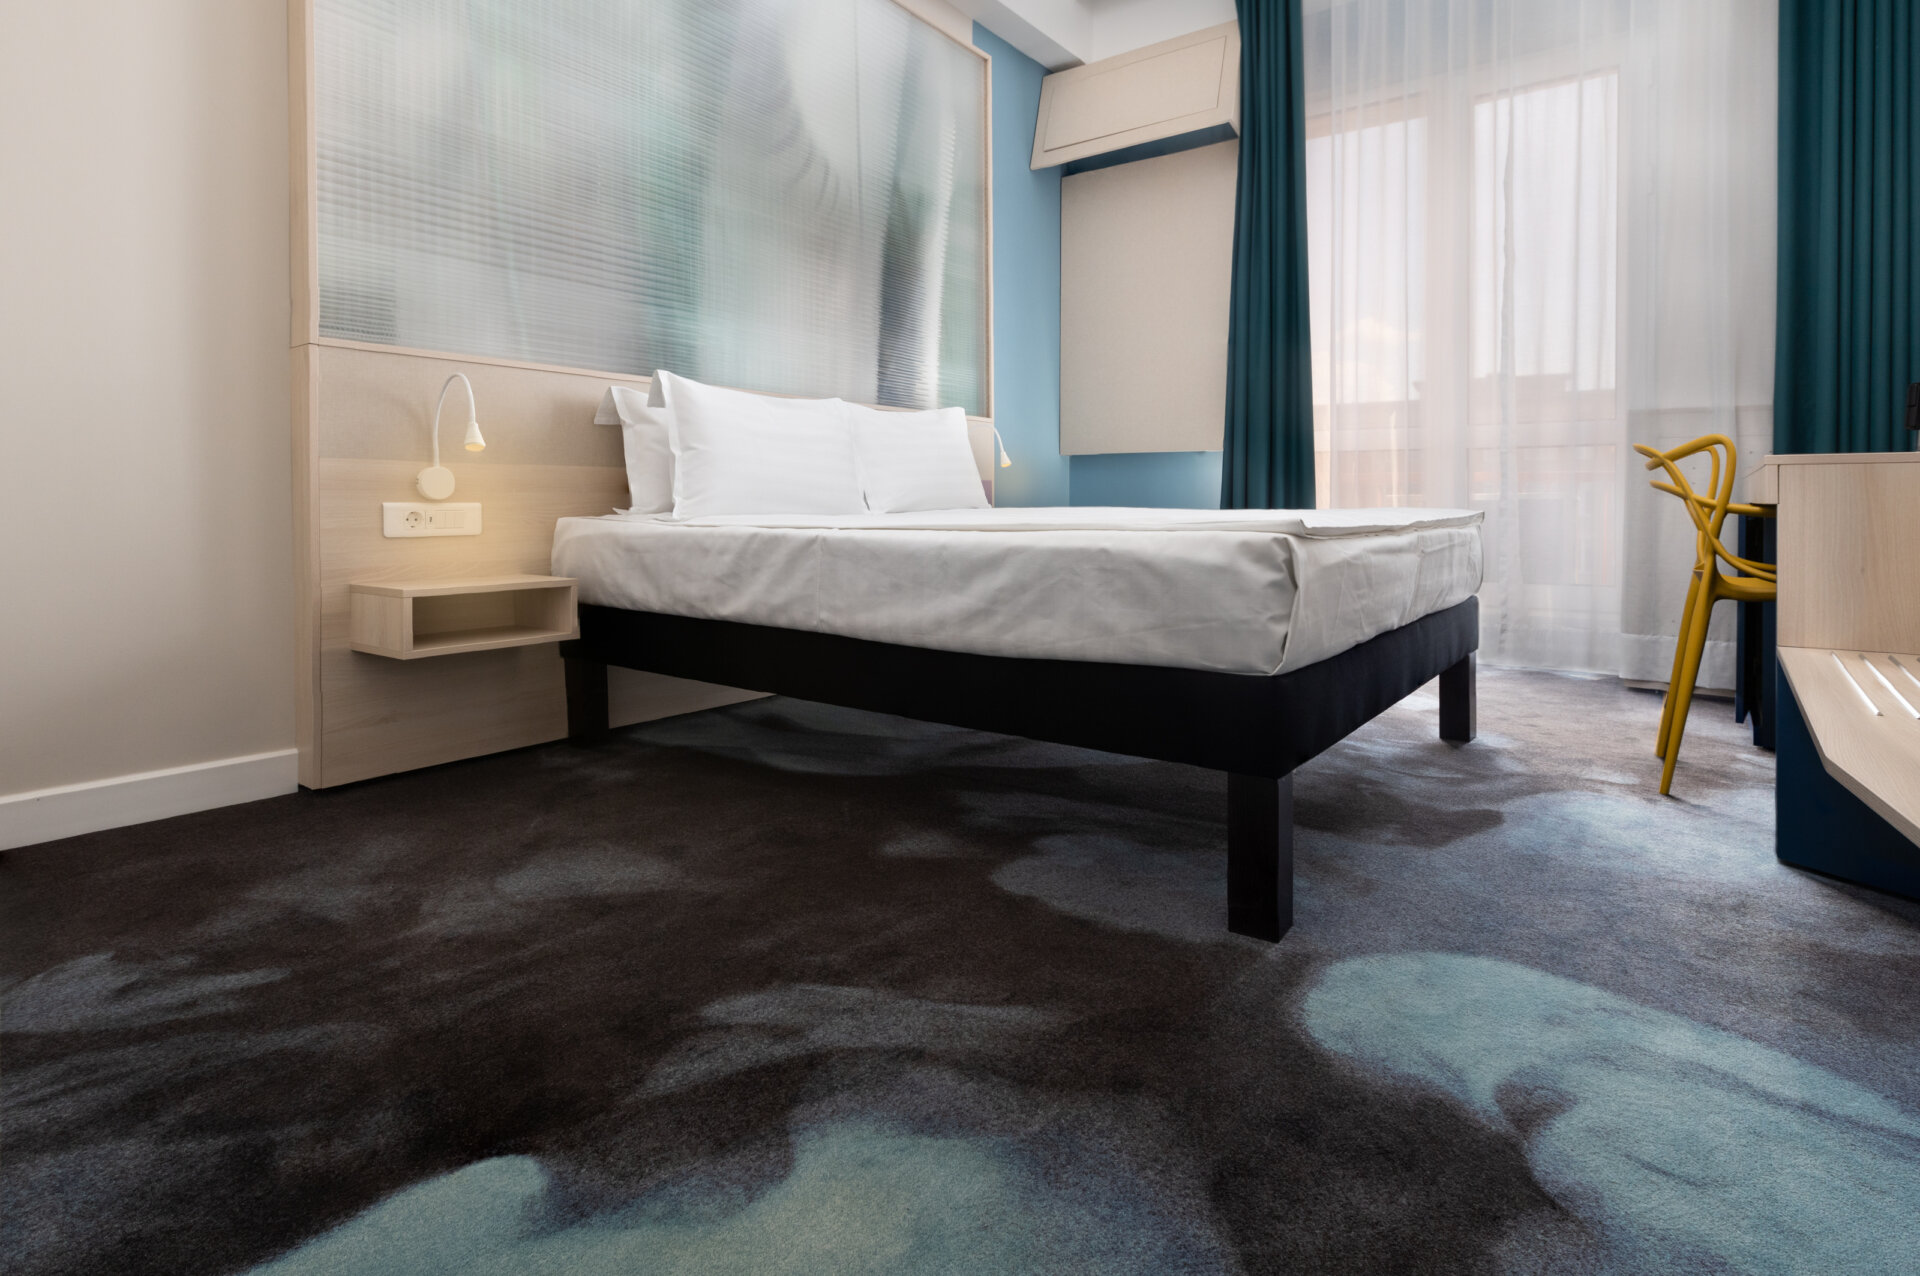 20210609-carpet&more-ibis-styles-galati-by-hugmedia-01